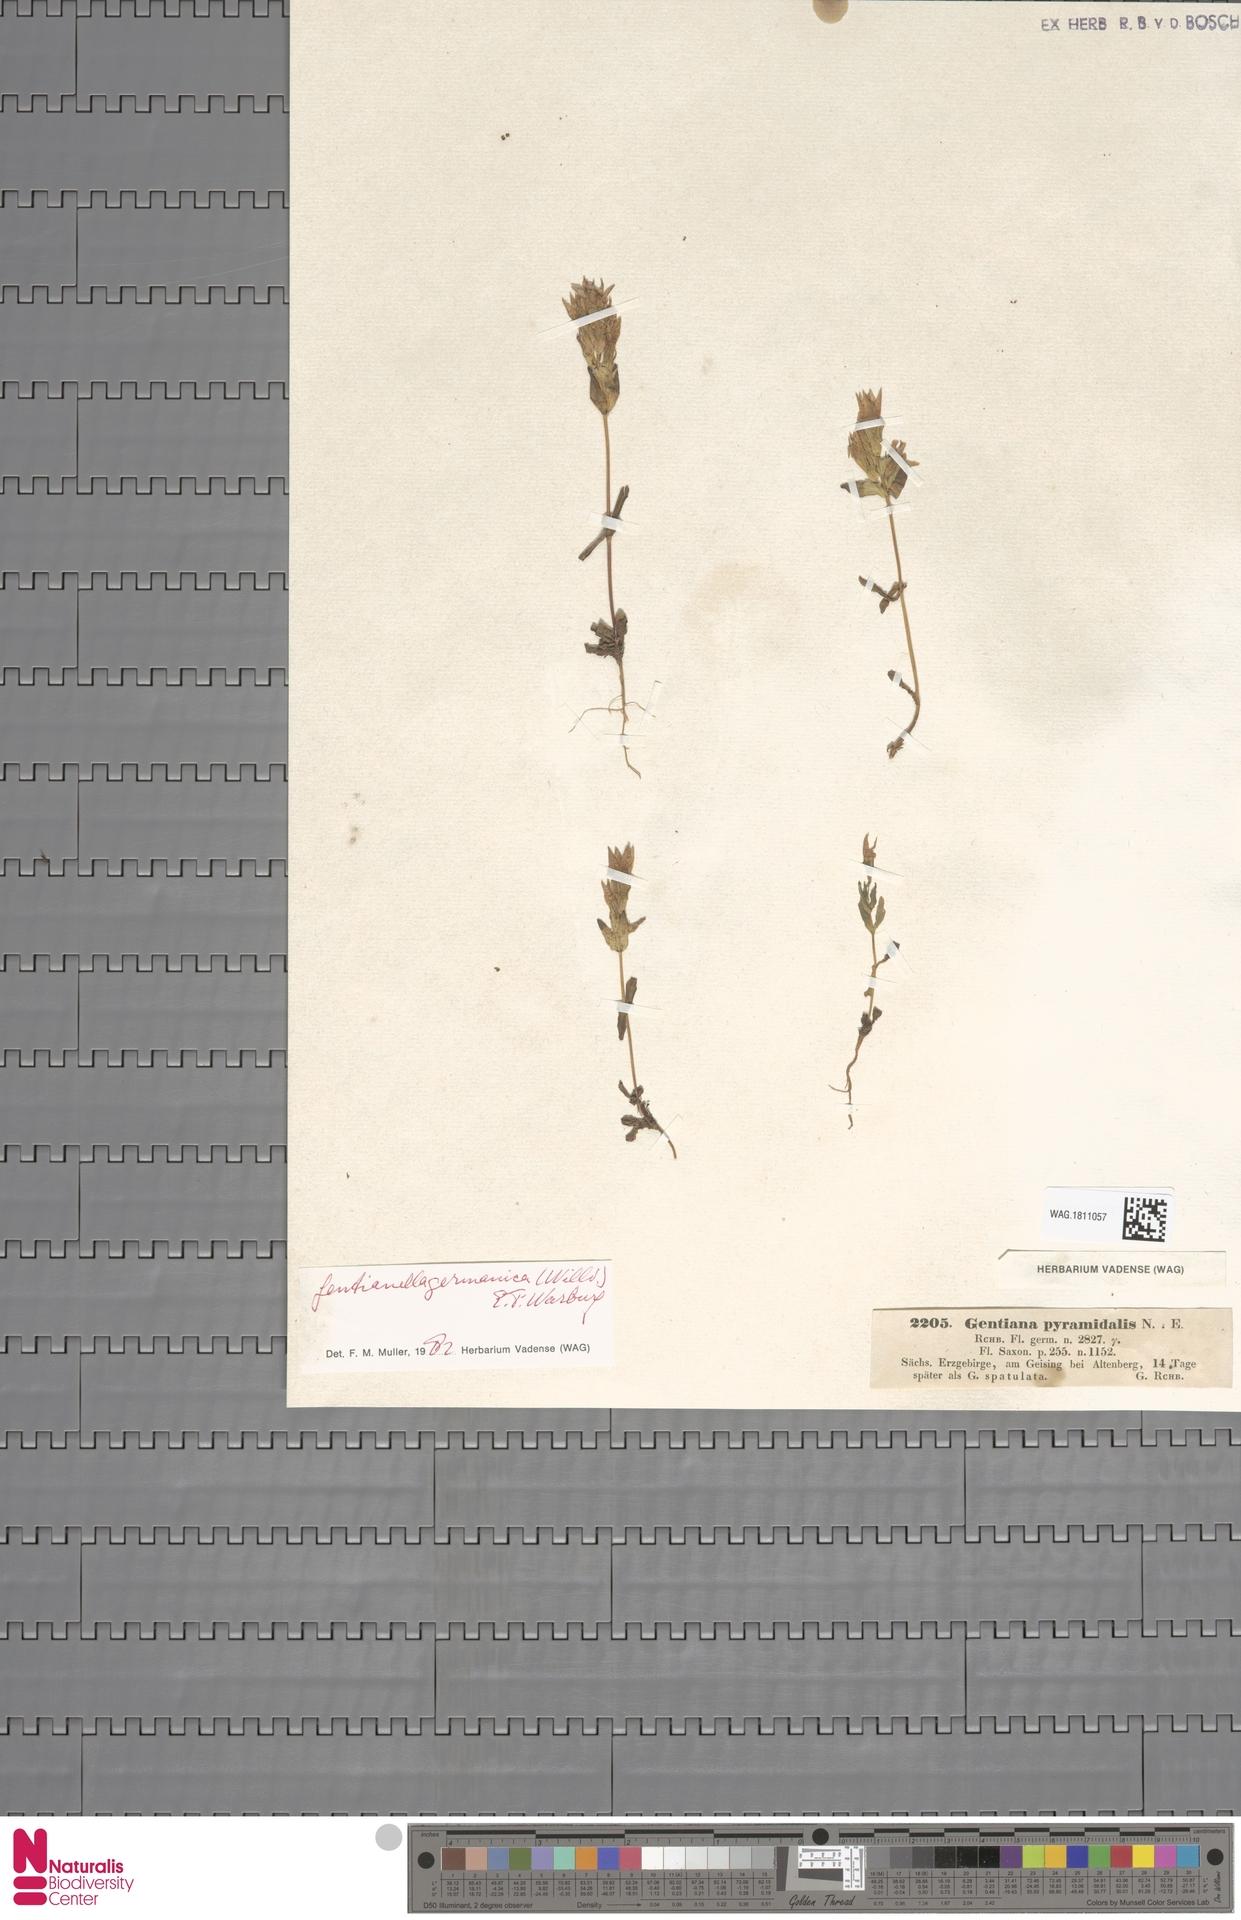 WAG.1811057 | Gentianella germanica (Willd.) E.F.Warb.